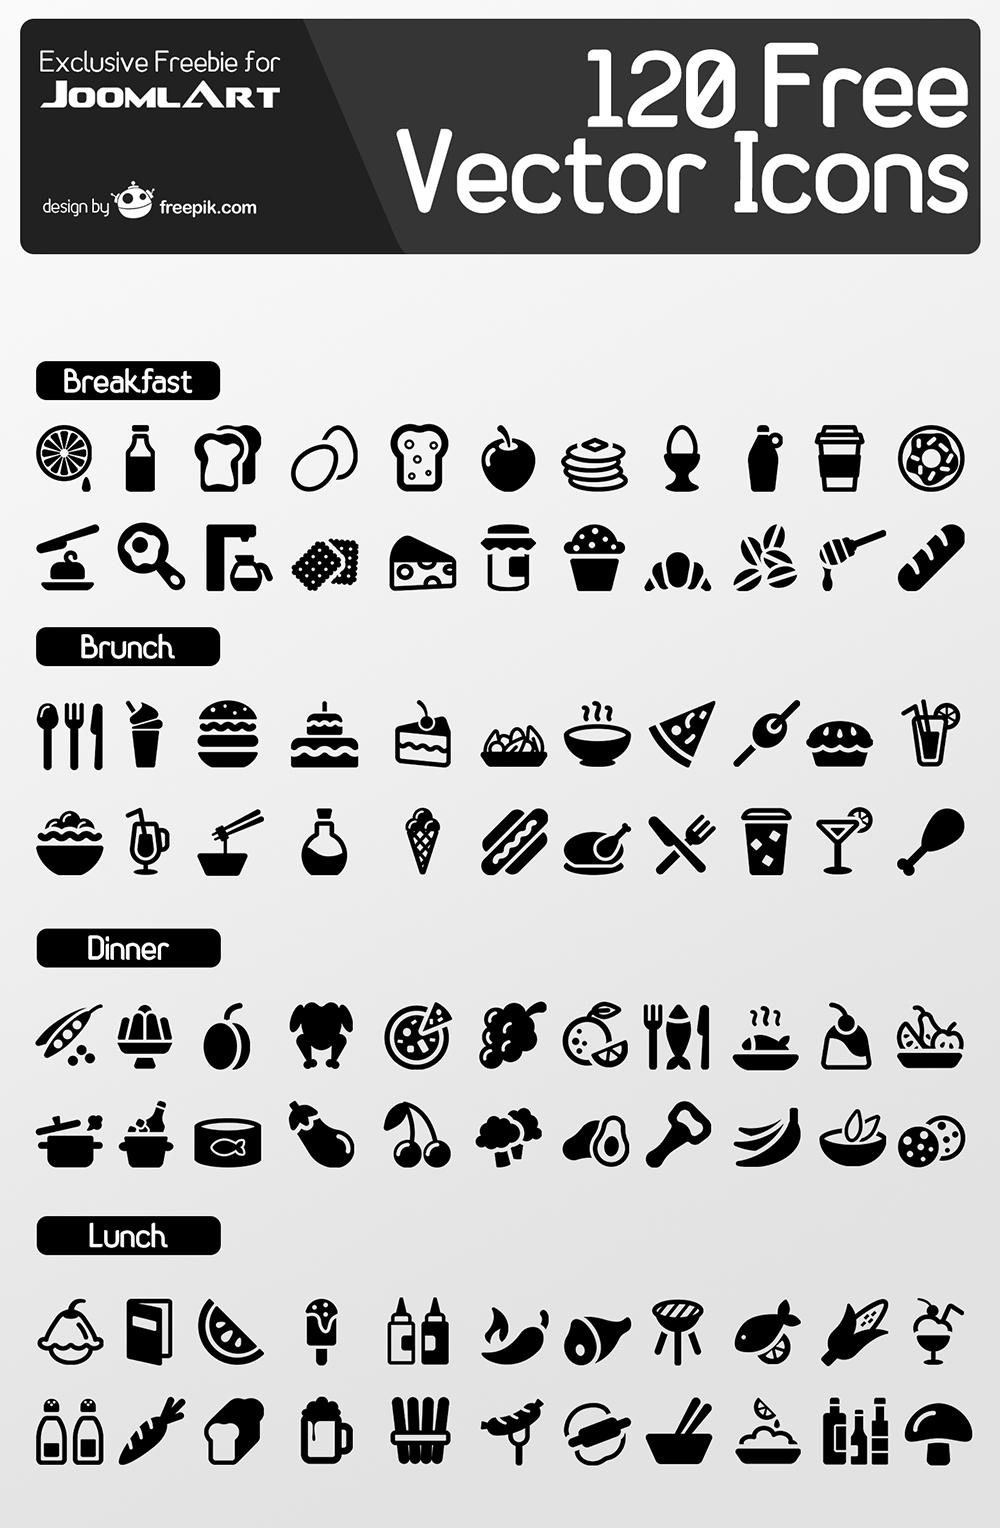 freebie meals vector set 120 icons png svg joomla